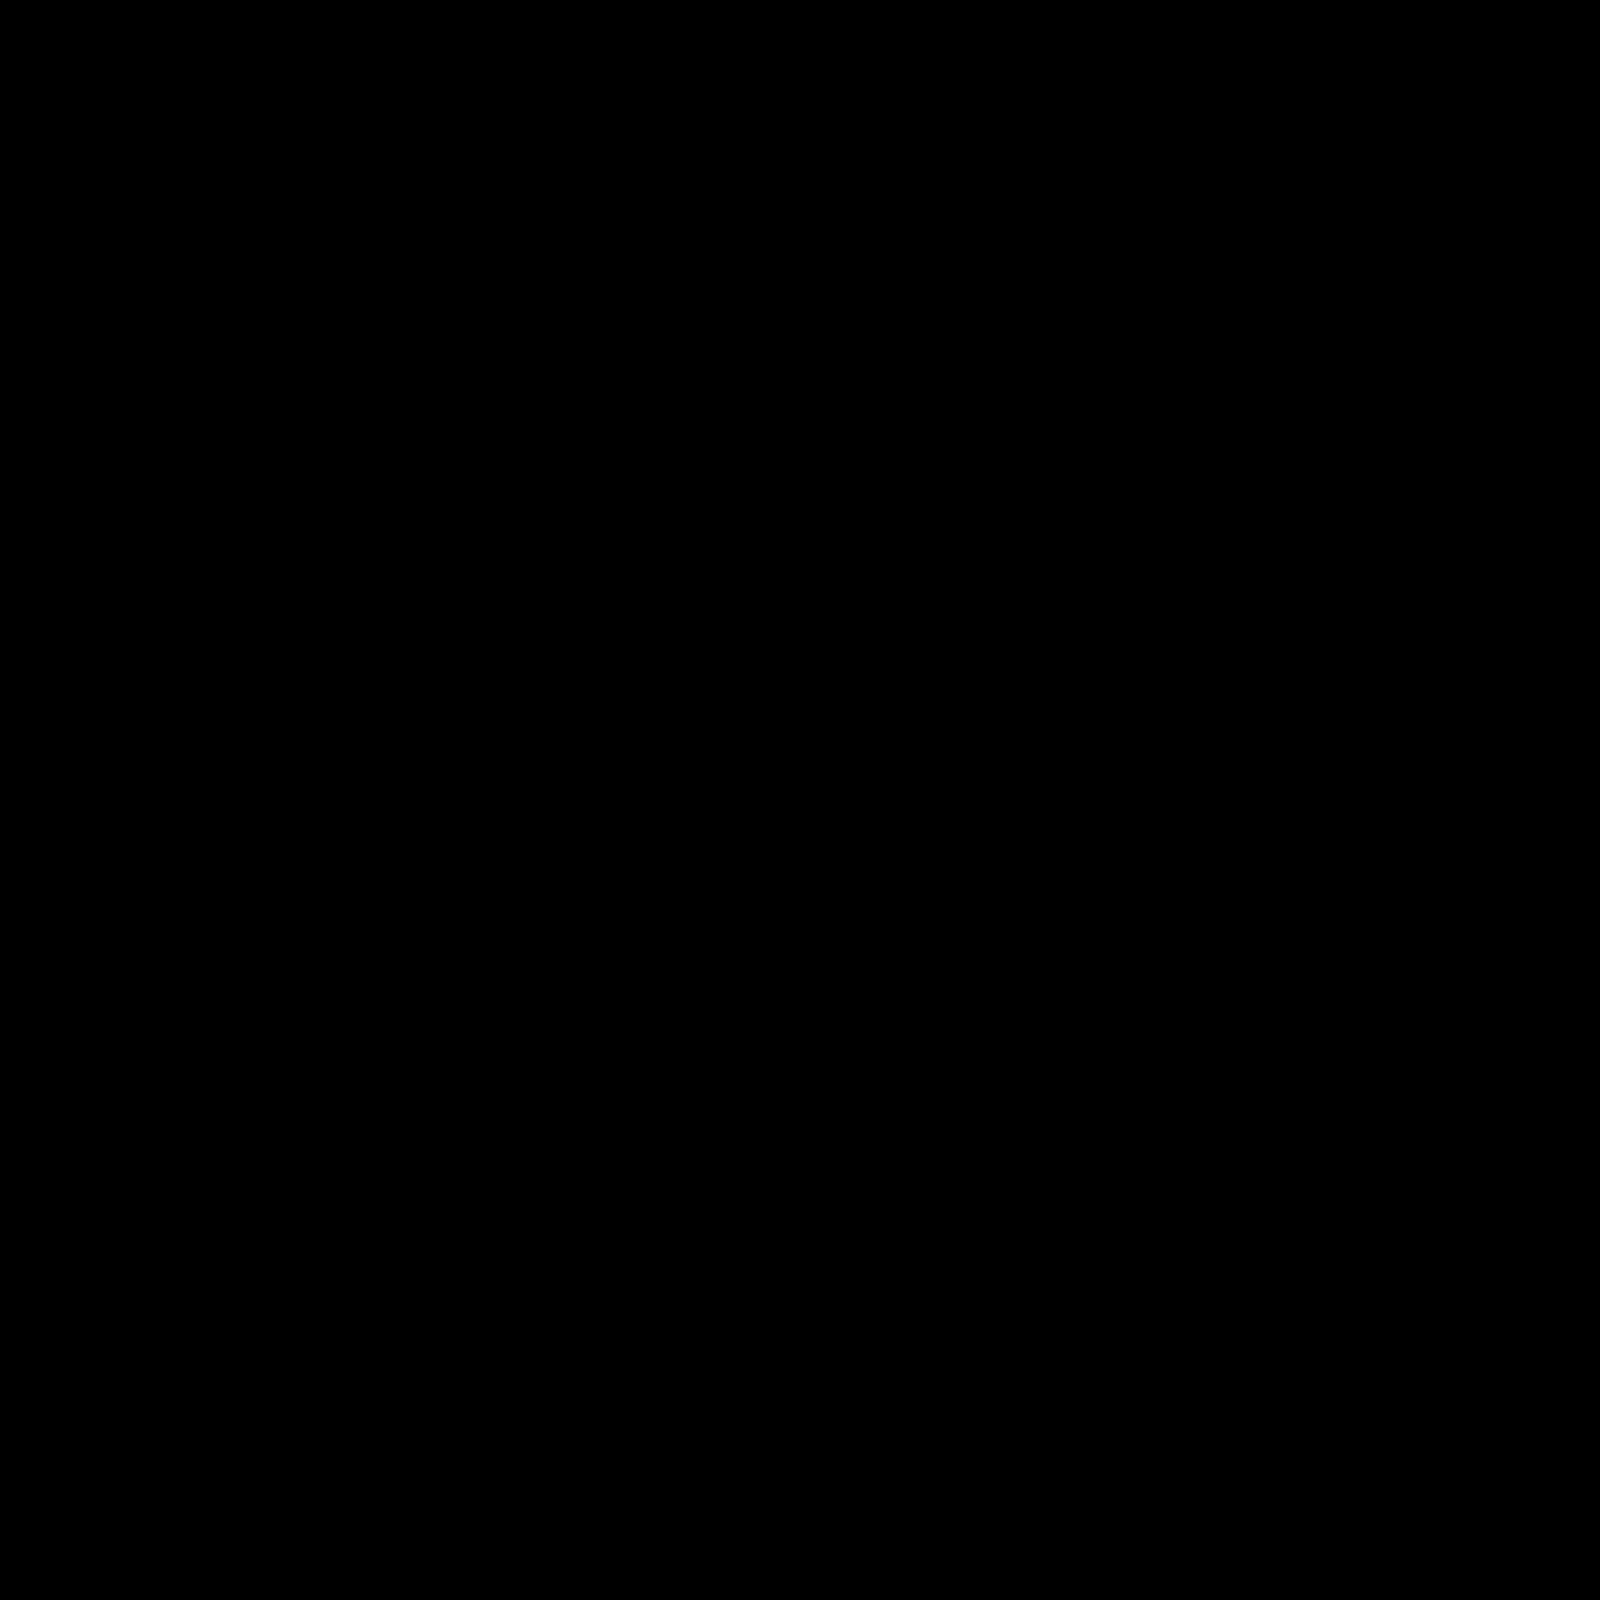 Tick Box PNG - 162945